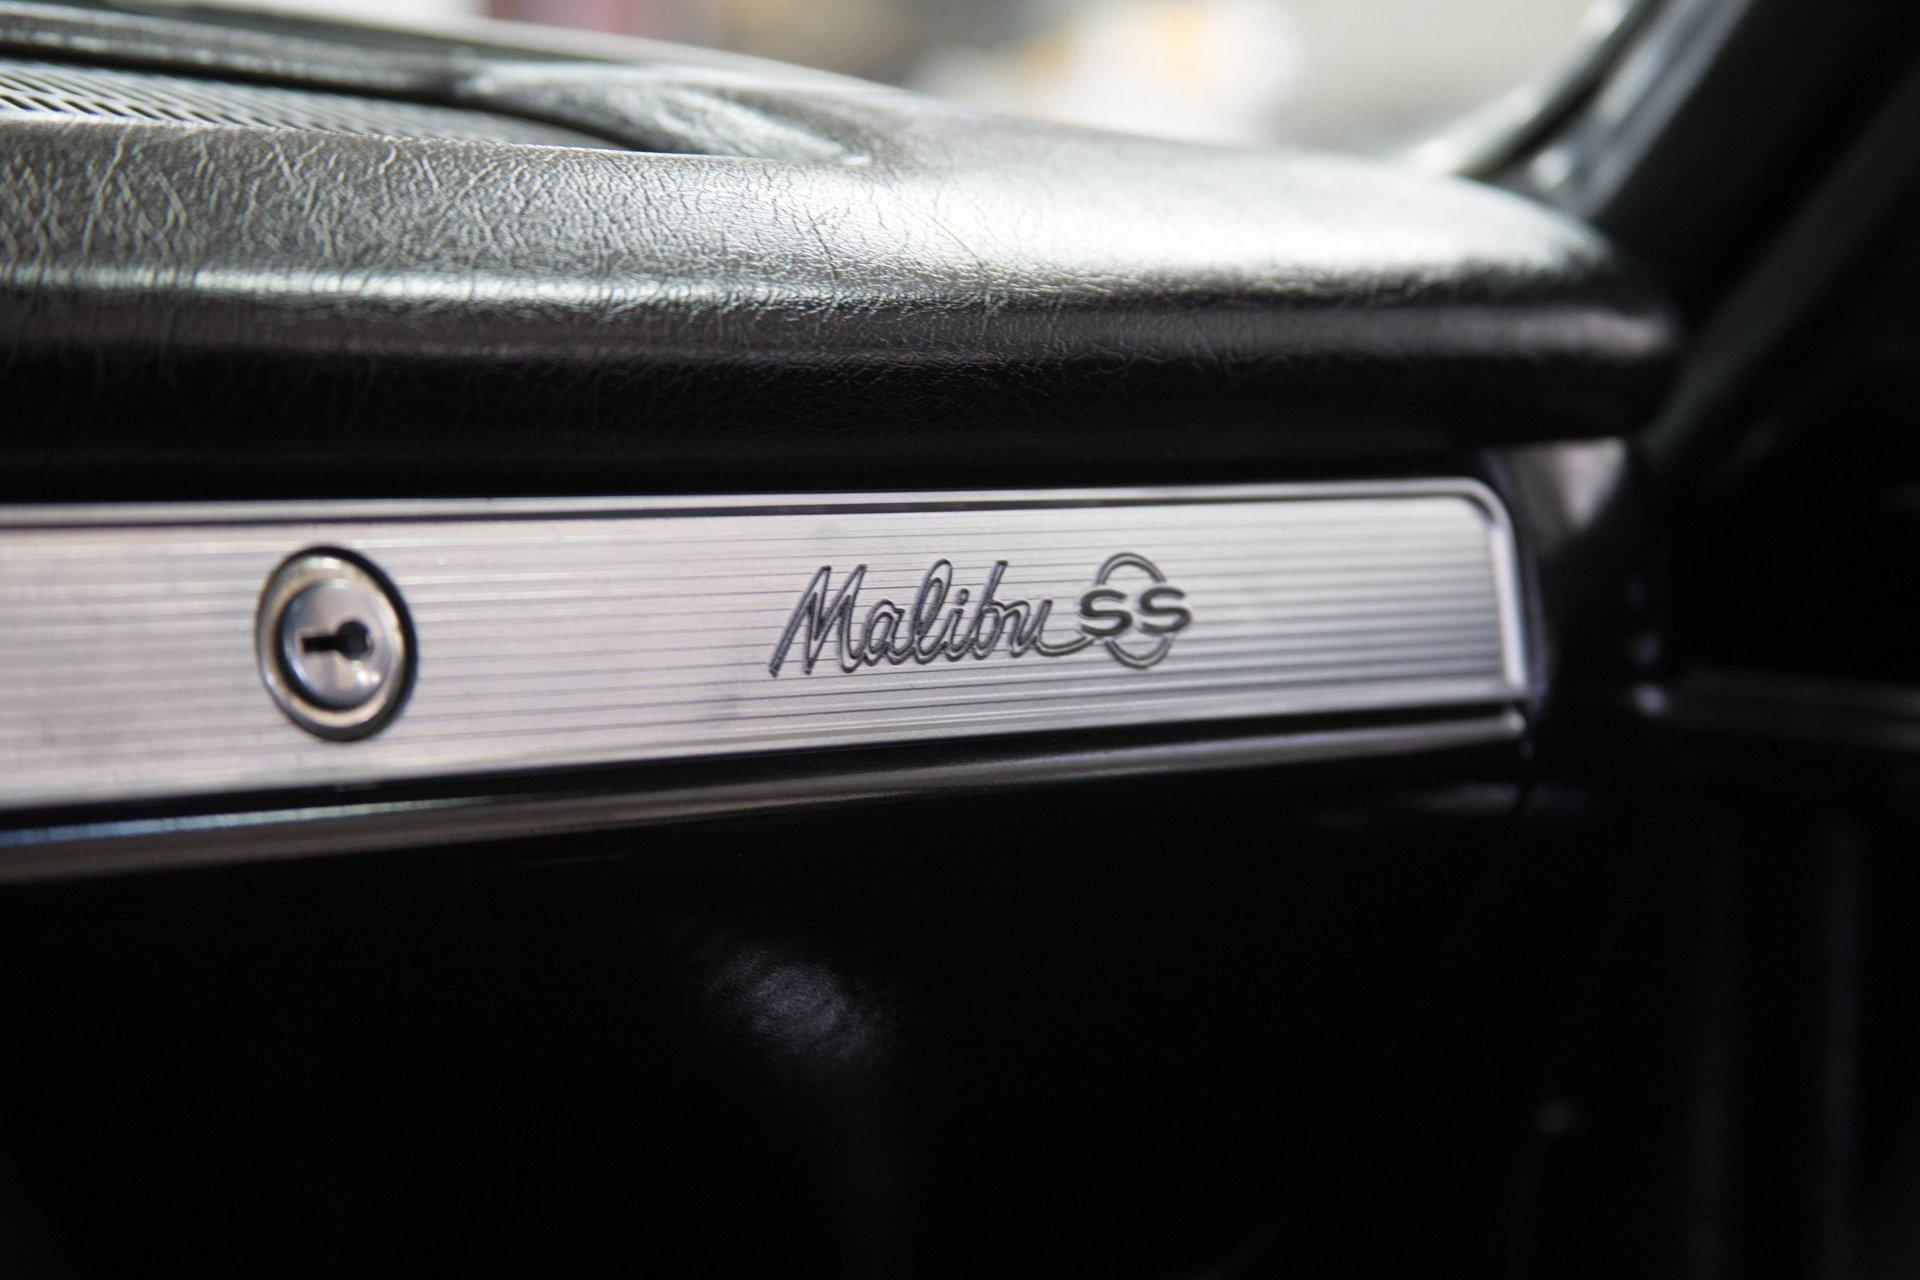 1964 Chevrolet Chevelle | Restore A Muscle Car™ LLC